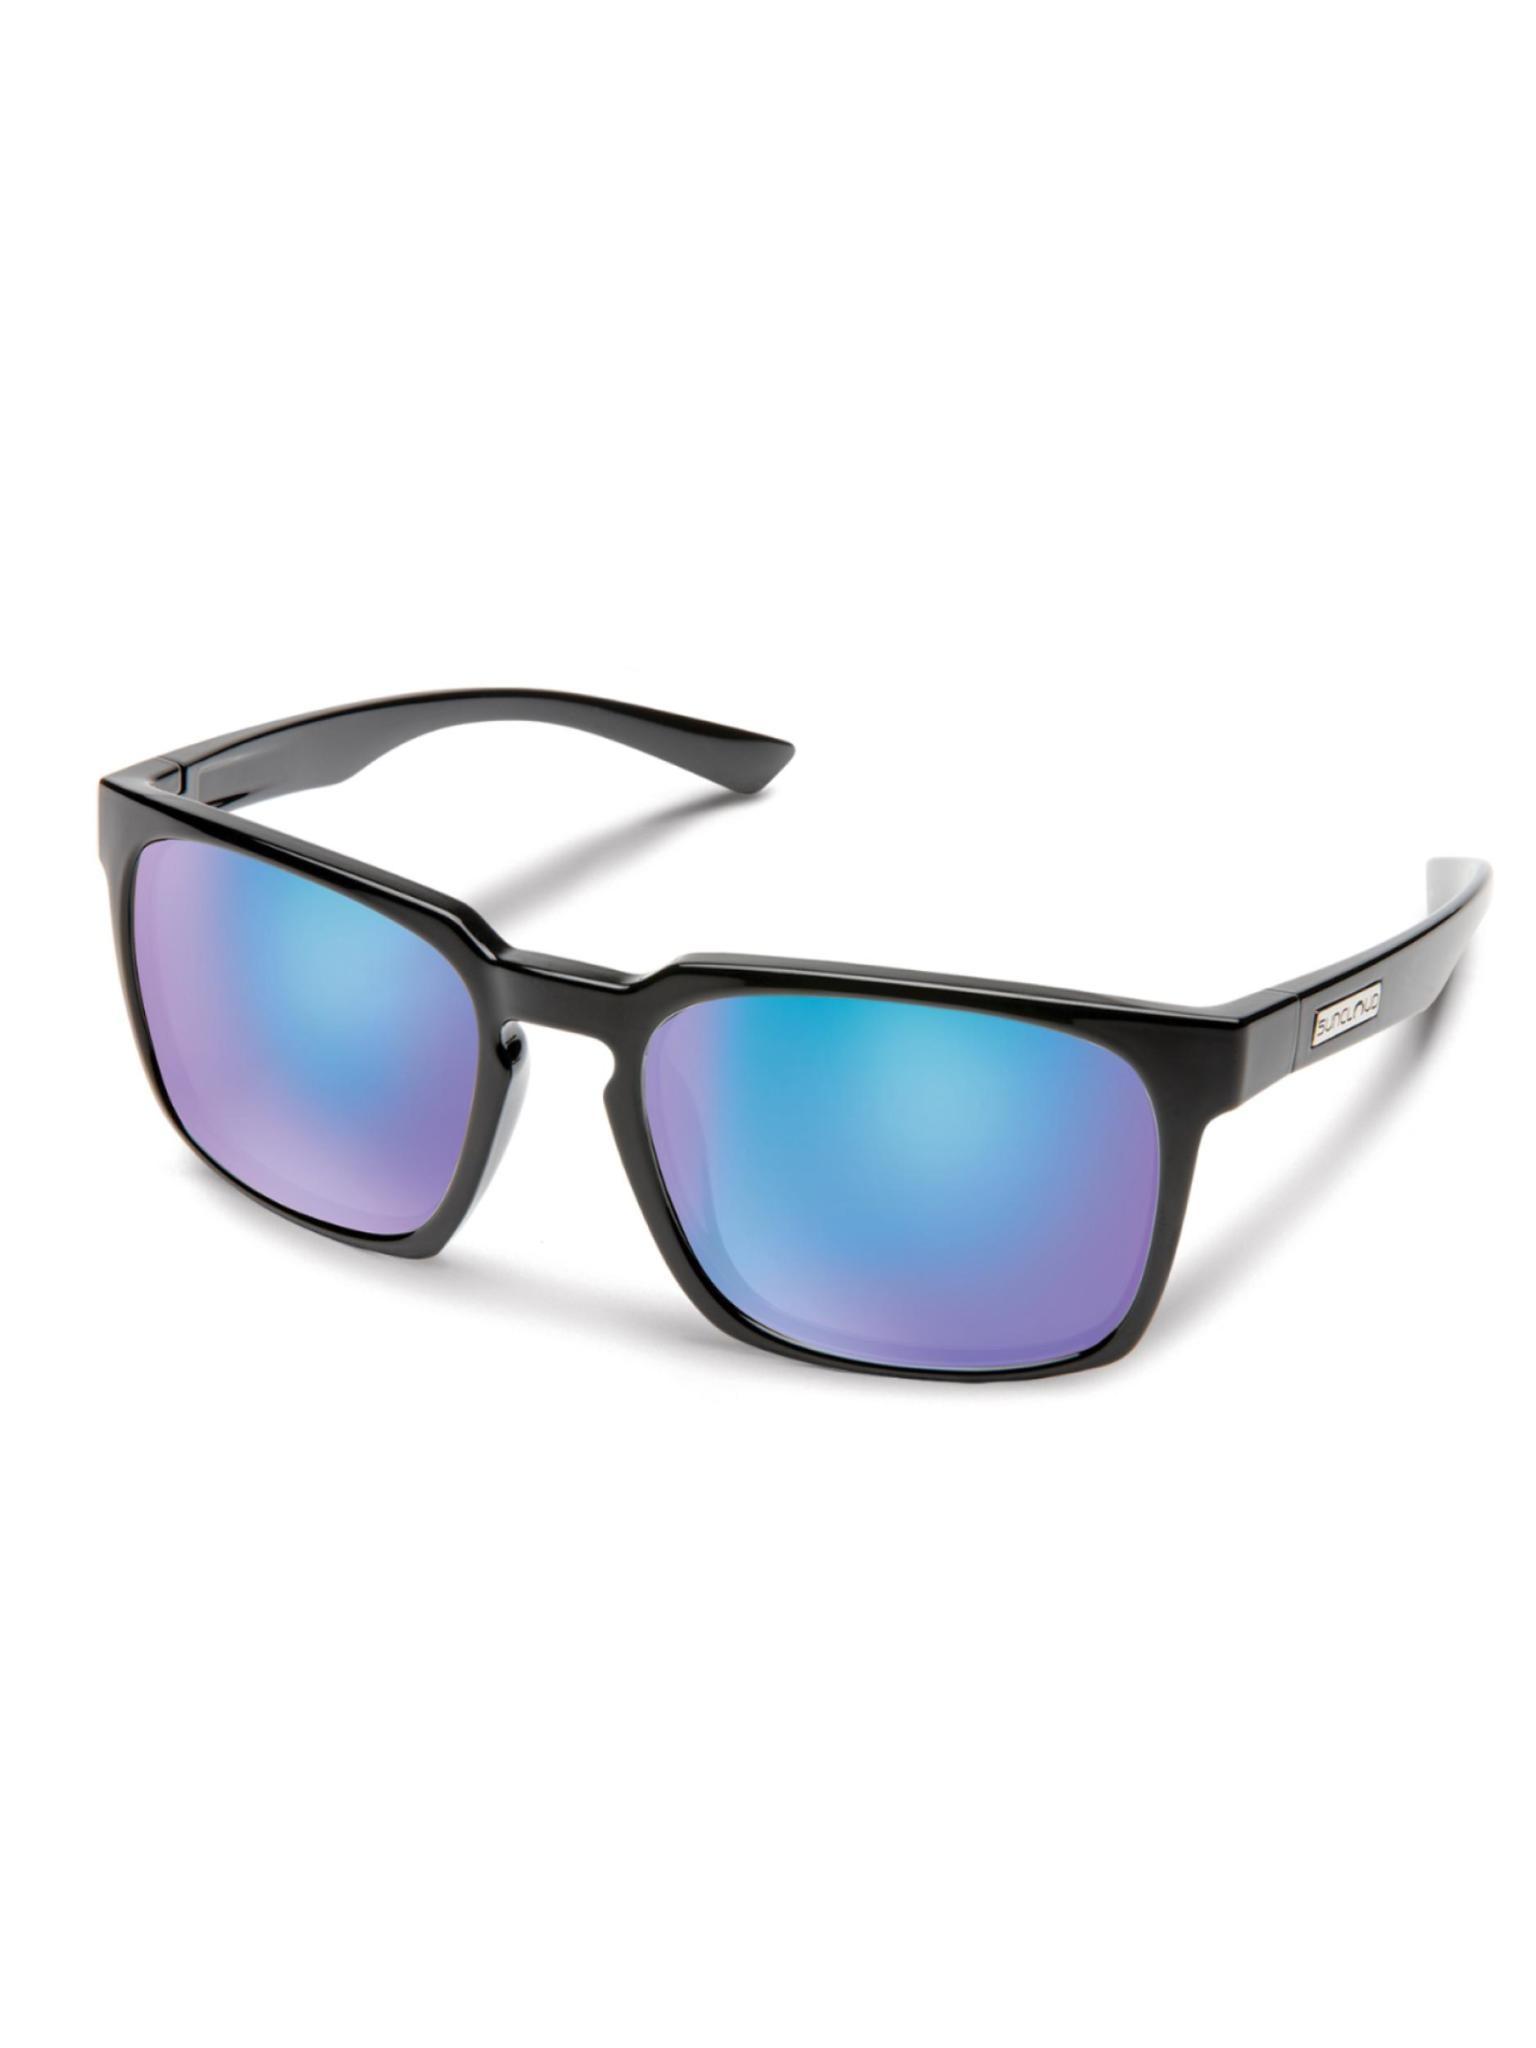 Hundo Sunglasses Black Polarized Blue Mirror